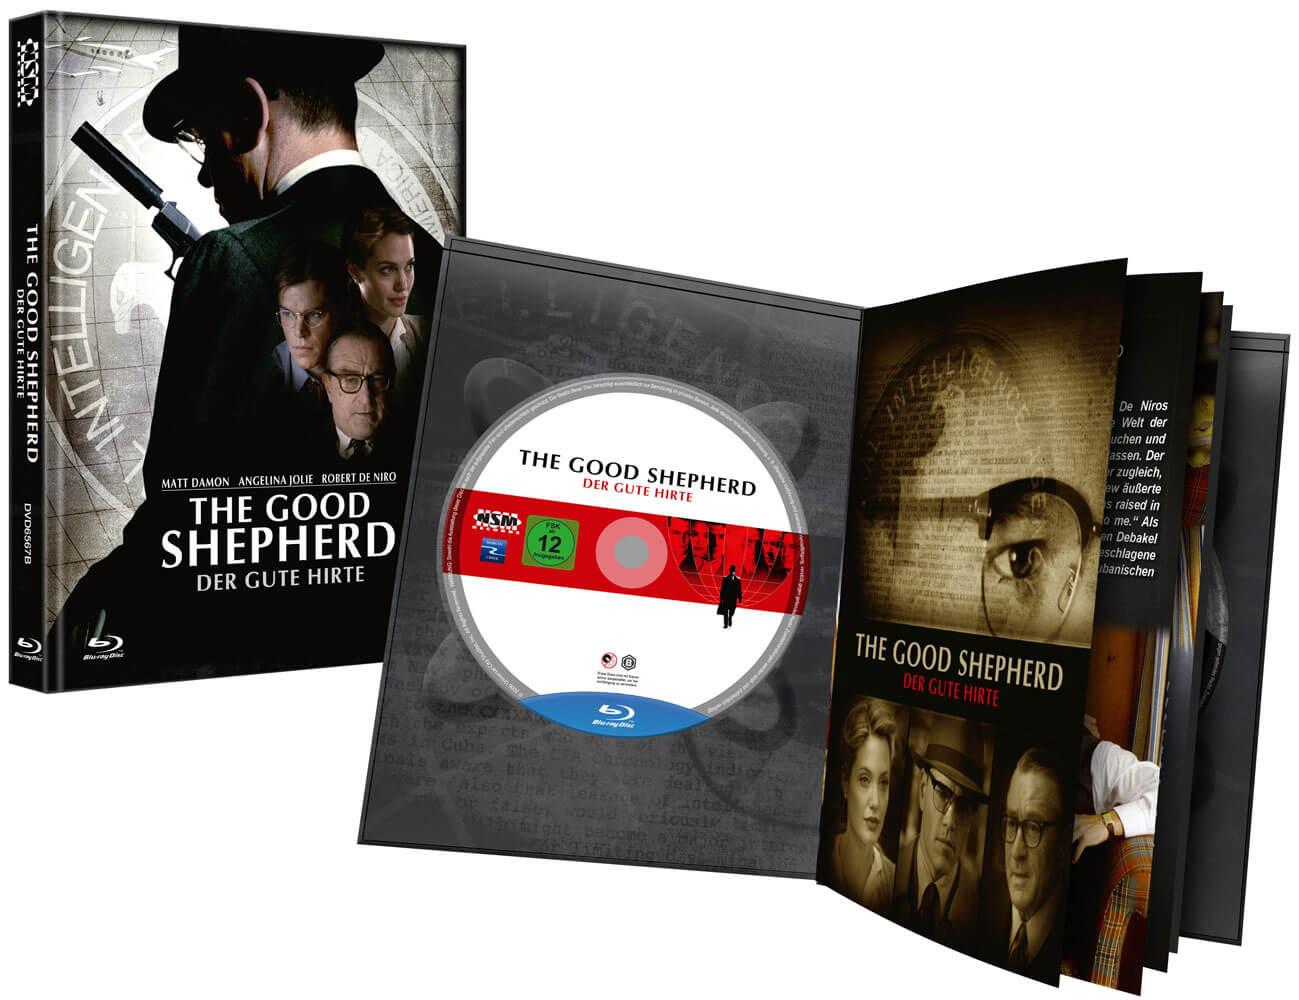 GOOD SHEPHERD THE - DER GUTE HIRTE (Blu-Ray+DVD) - Cover B - Mediabook Edition